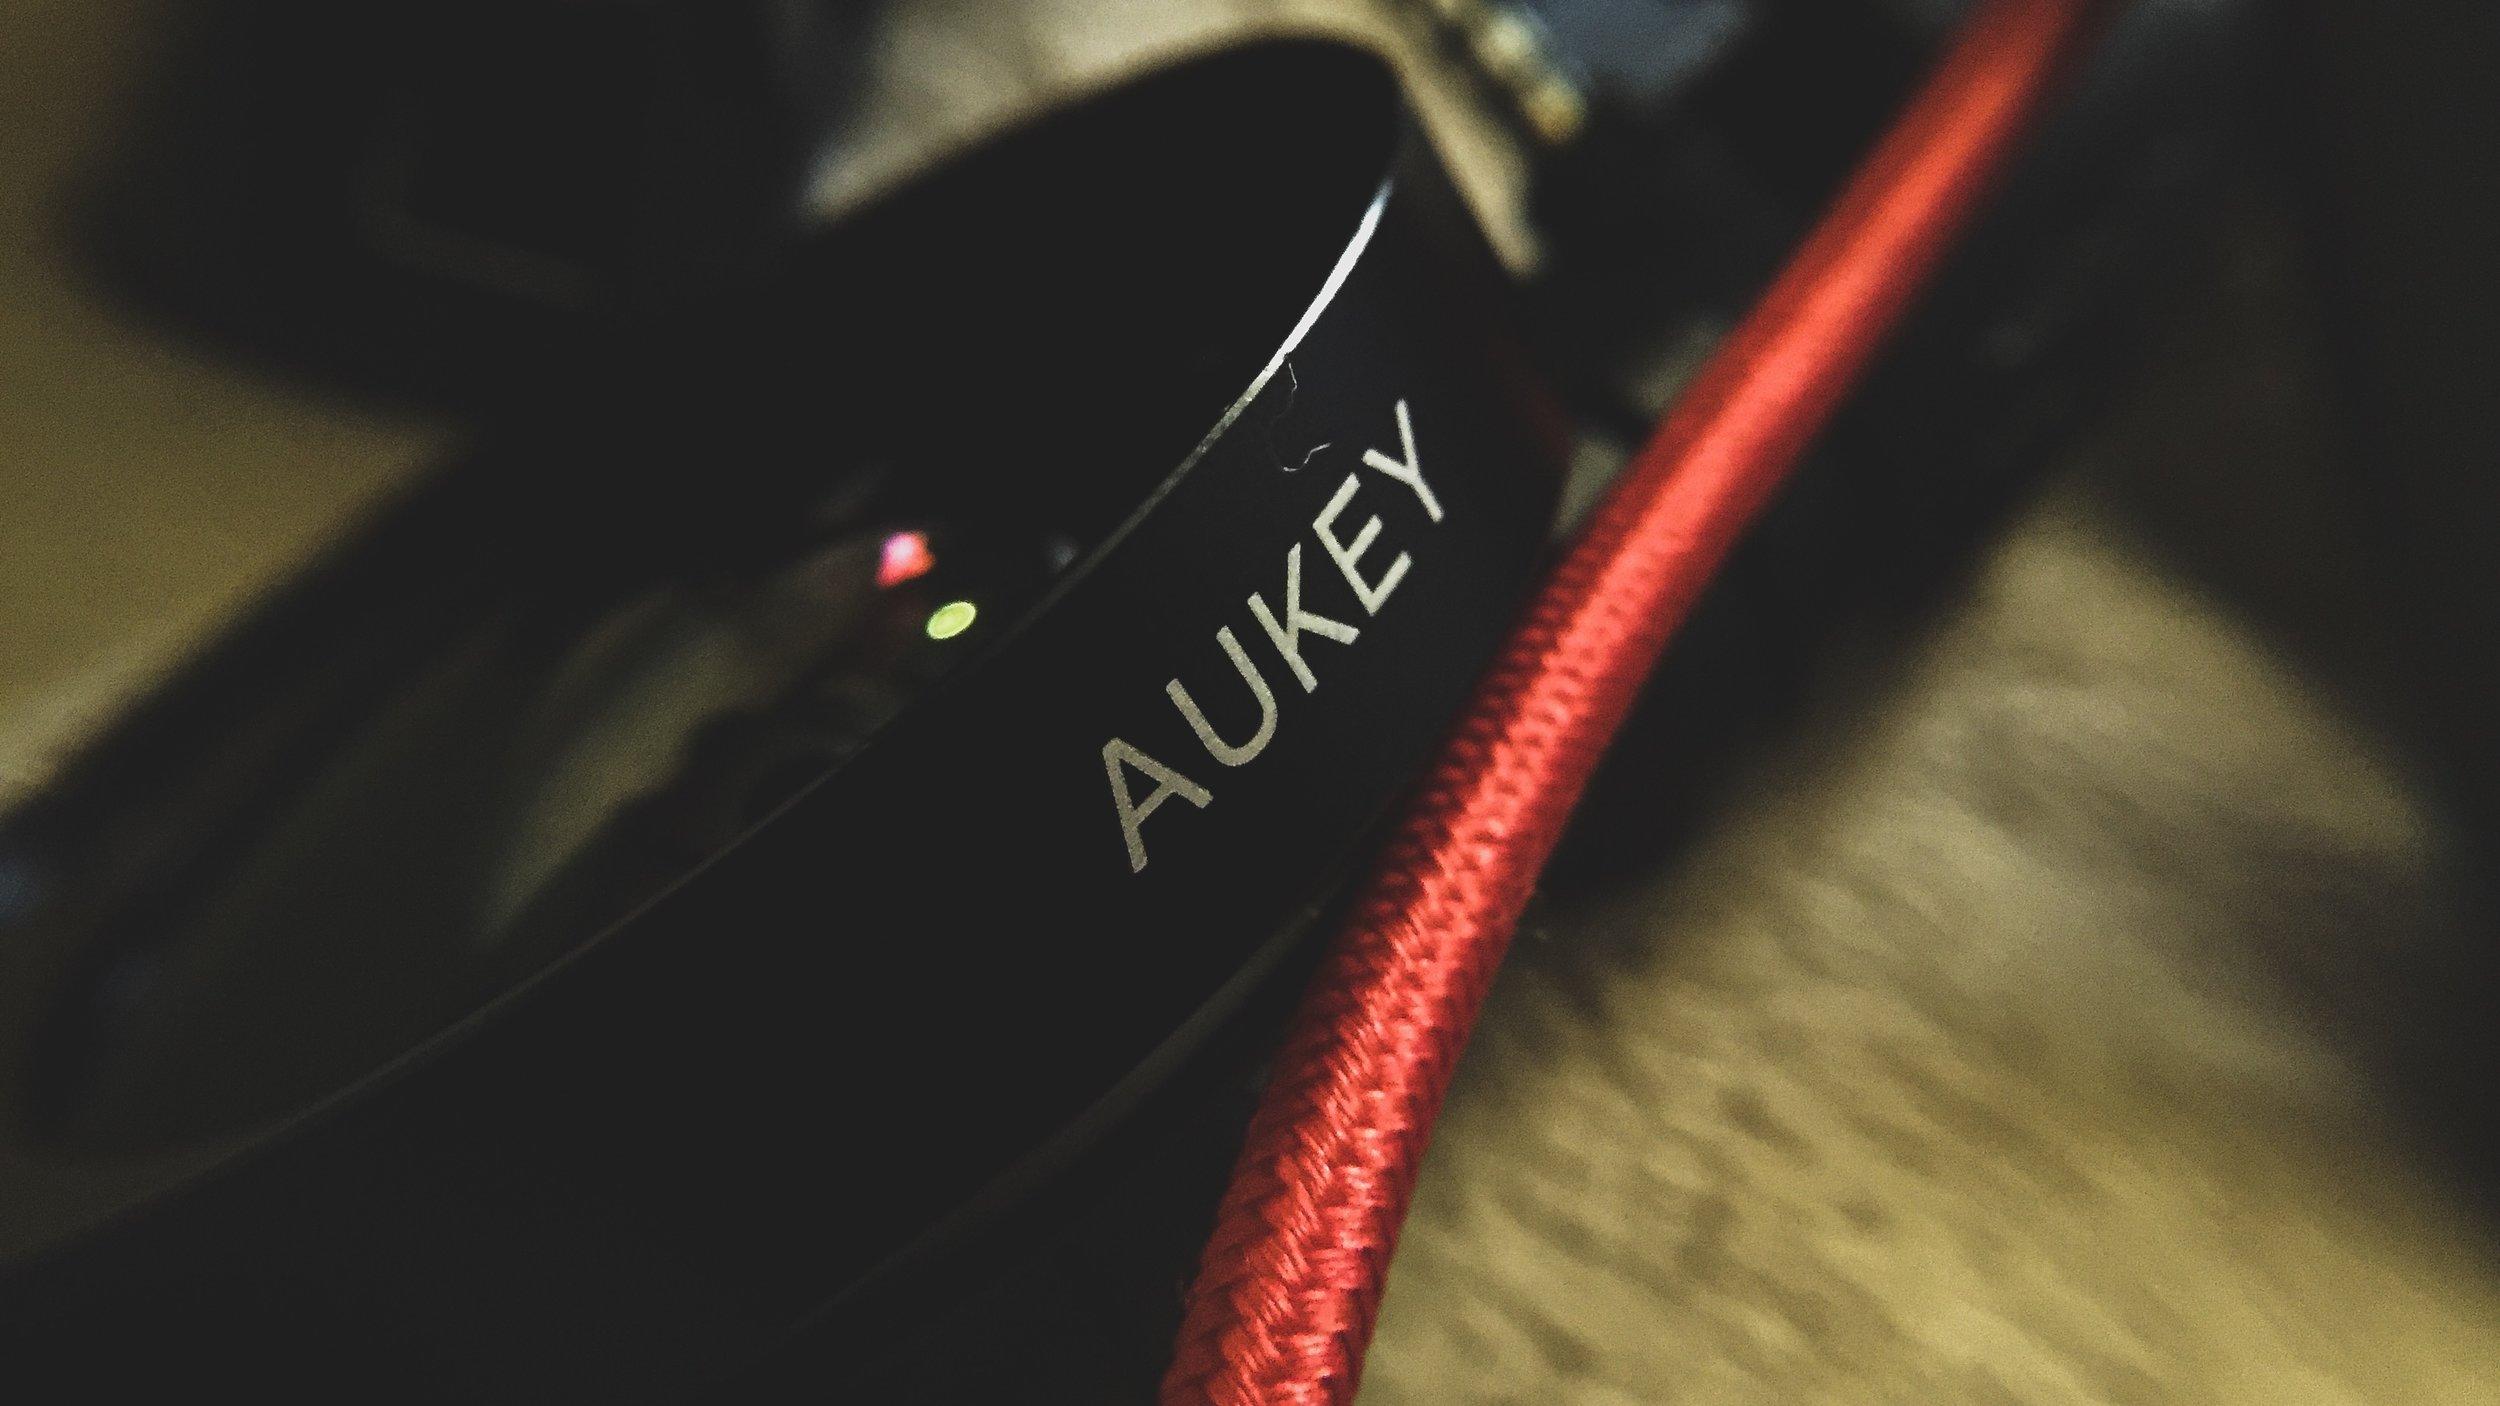 AUKEY Ora iPhone Camera Lens, 0.45x 120° Wide Angle + 15x Macro Clip-on $30